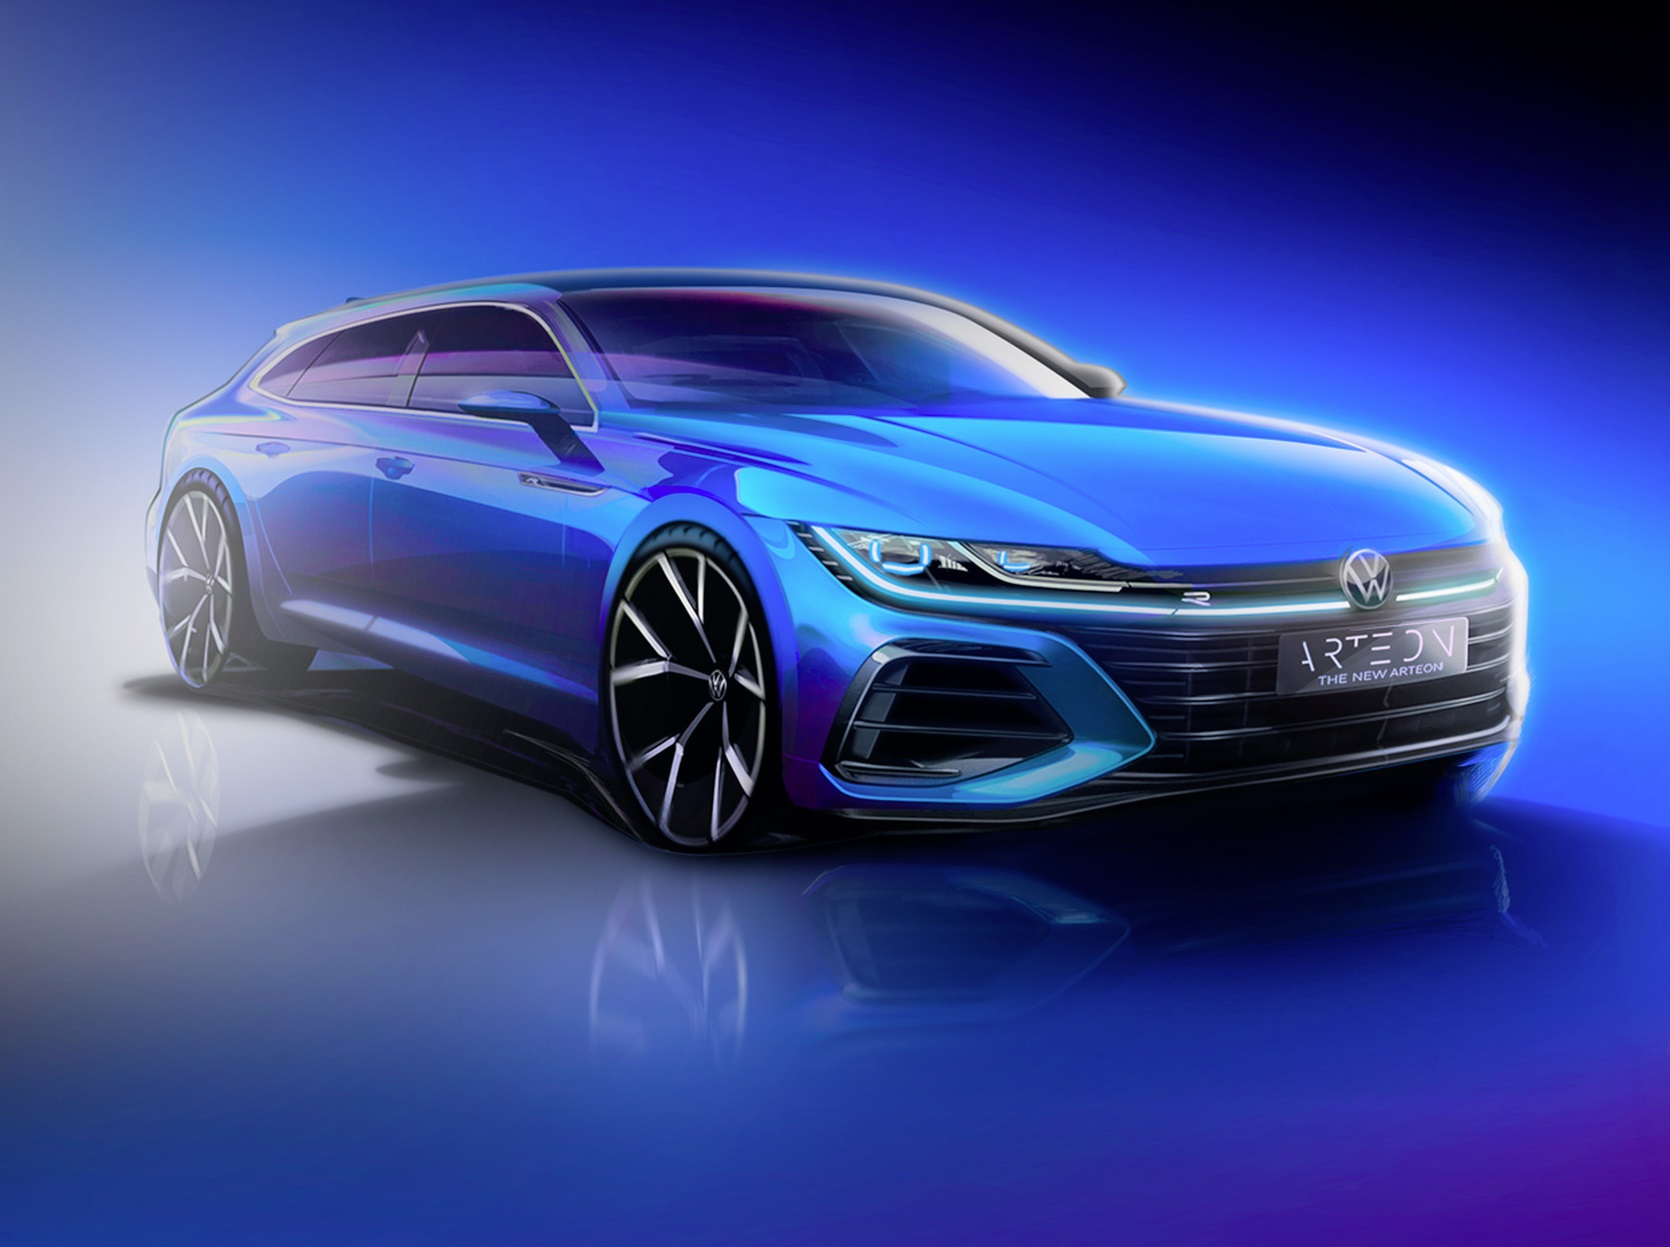 Volkswagen Arteon príde aj vo verzii Shooting Brake